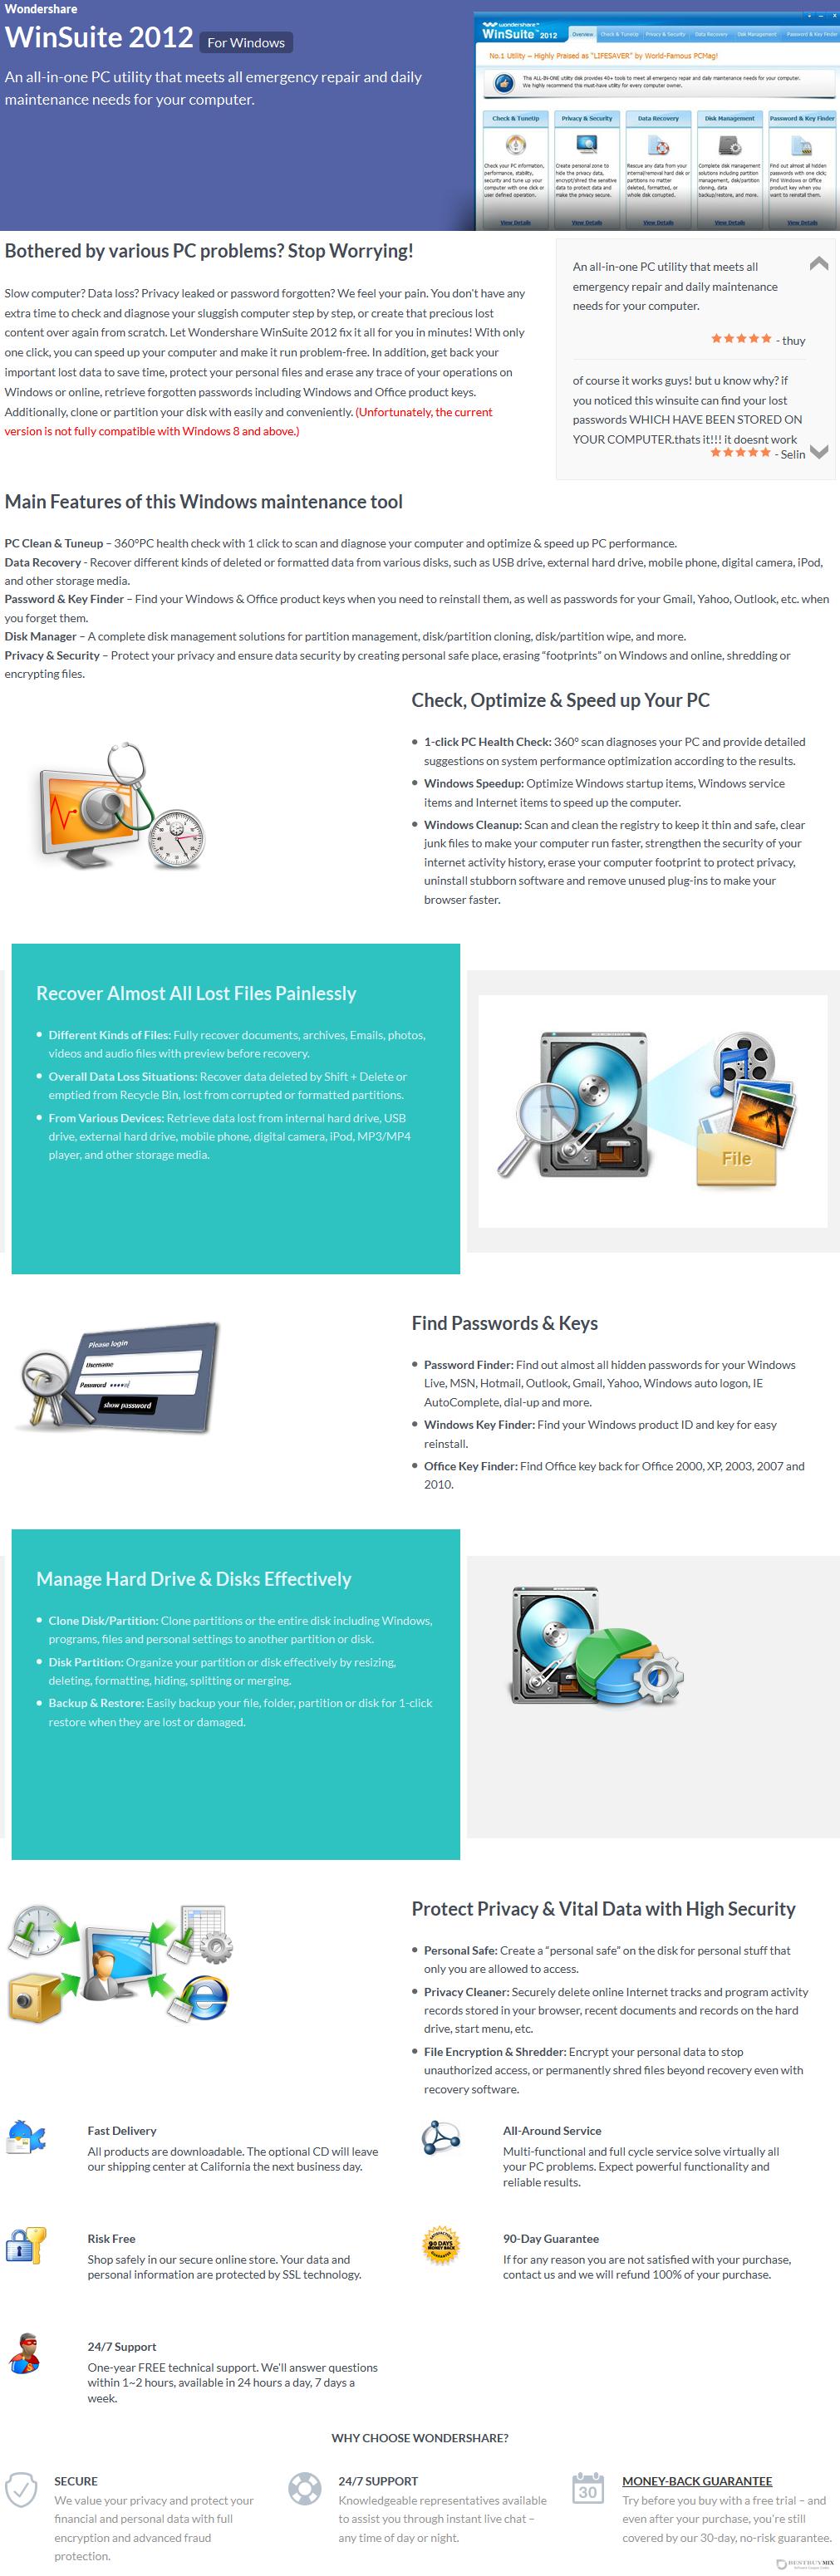 Wondershare WinSuite 2012 Discount Coupon Code